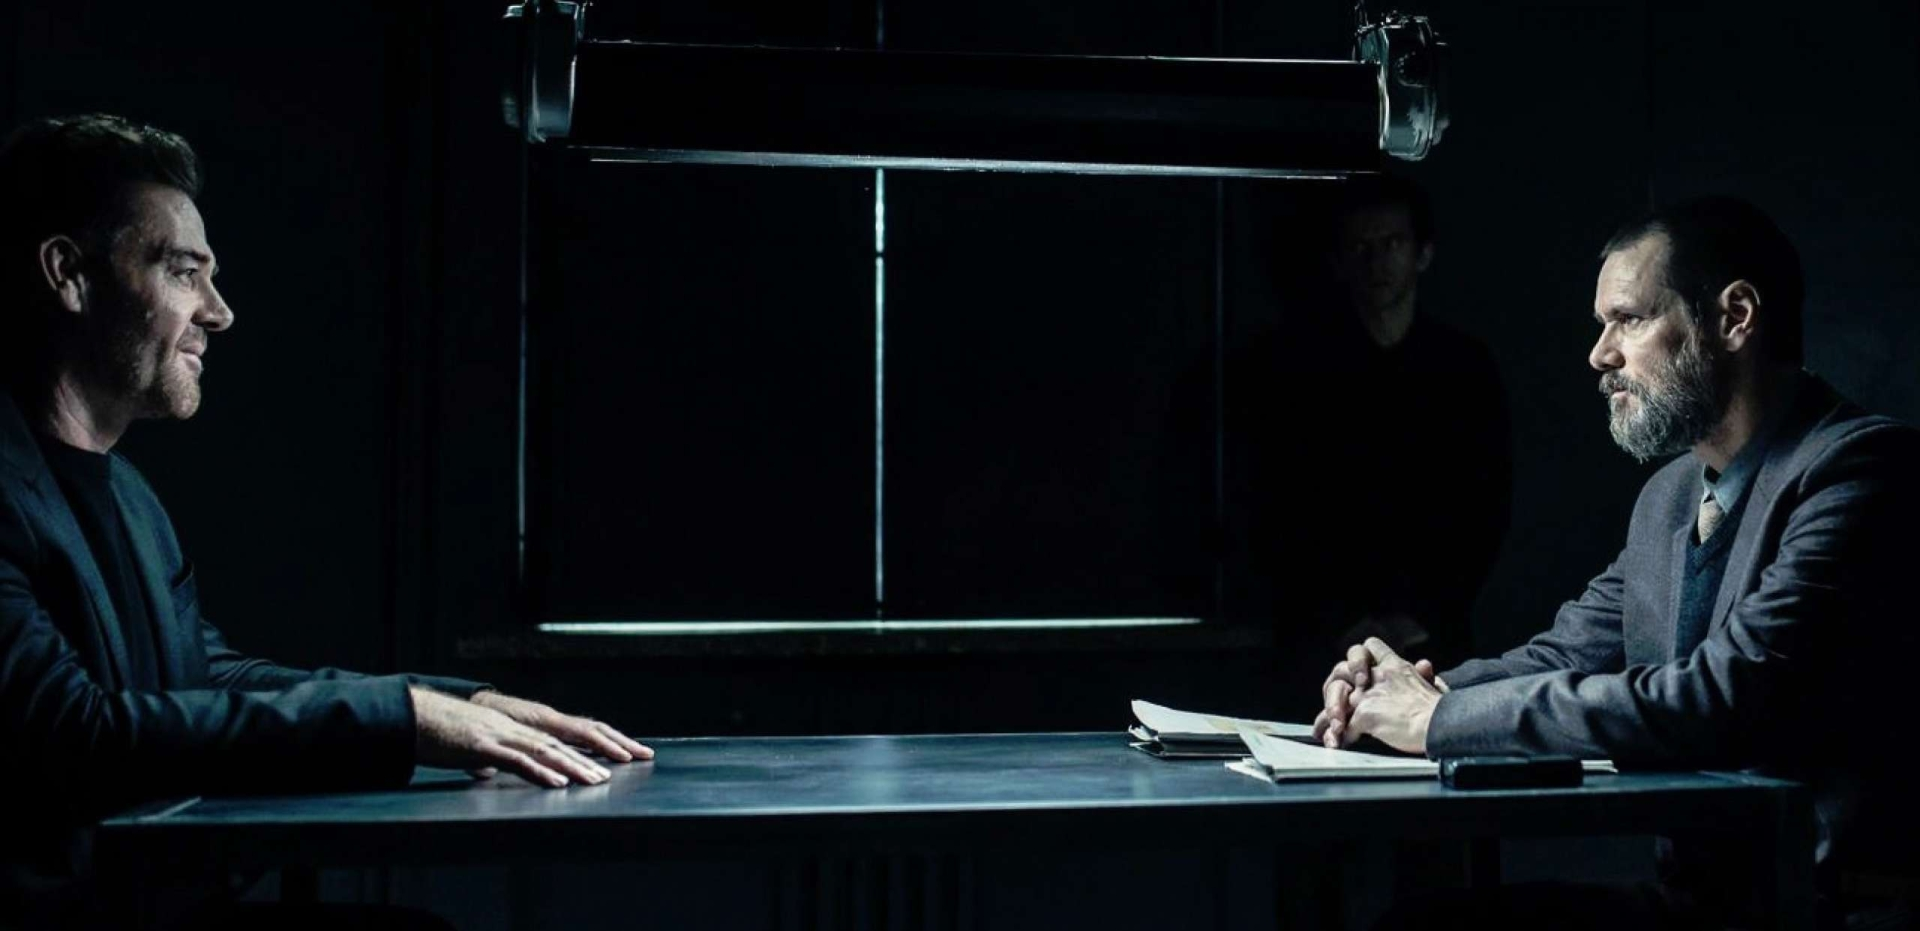 Dark Crimes - CineFatti